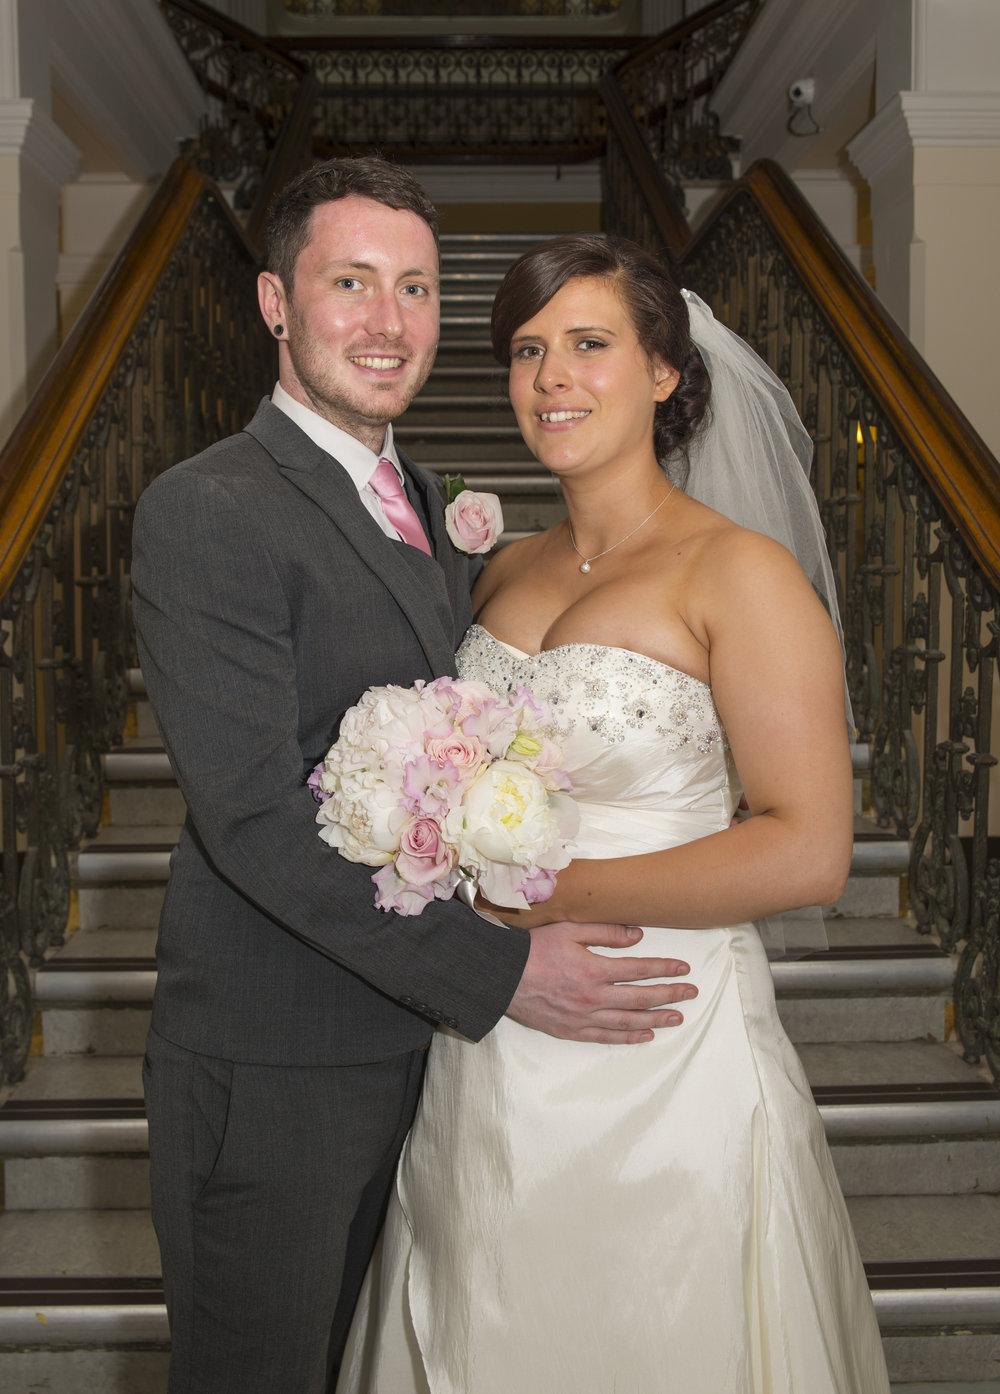 Wedding Photography - Brighton, Town Hall 6